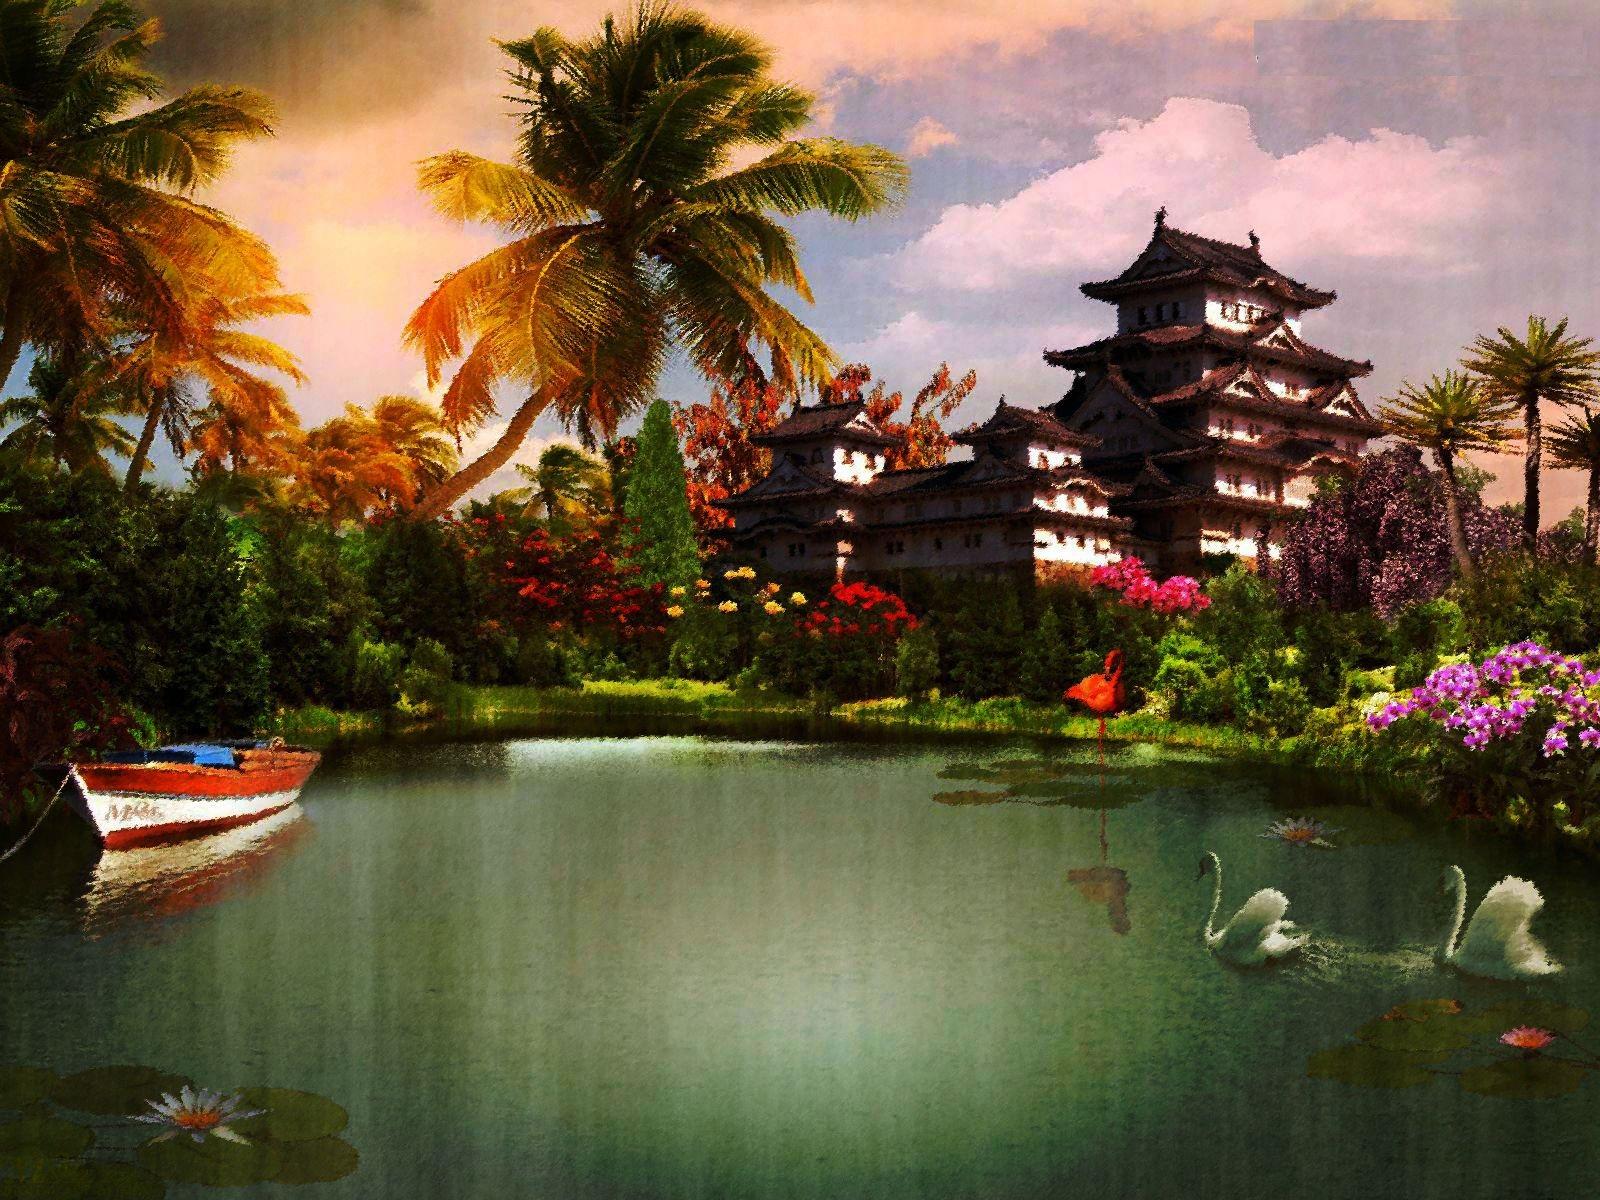 Beautiful Nature Images HD Wallpaper - all 4u wallpaper